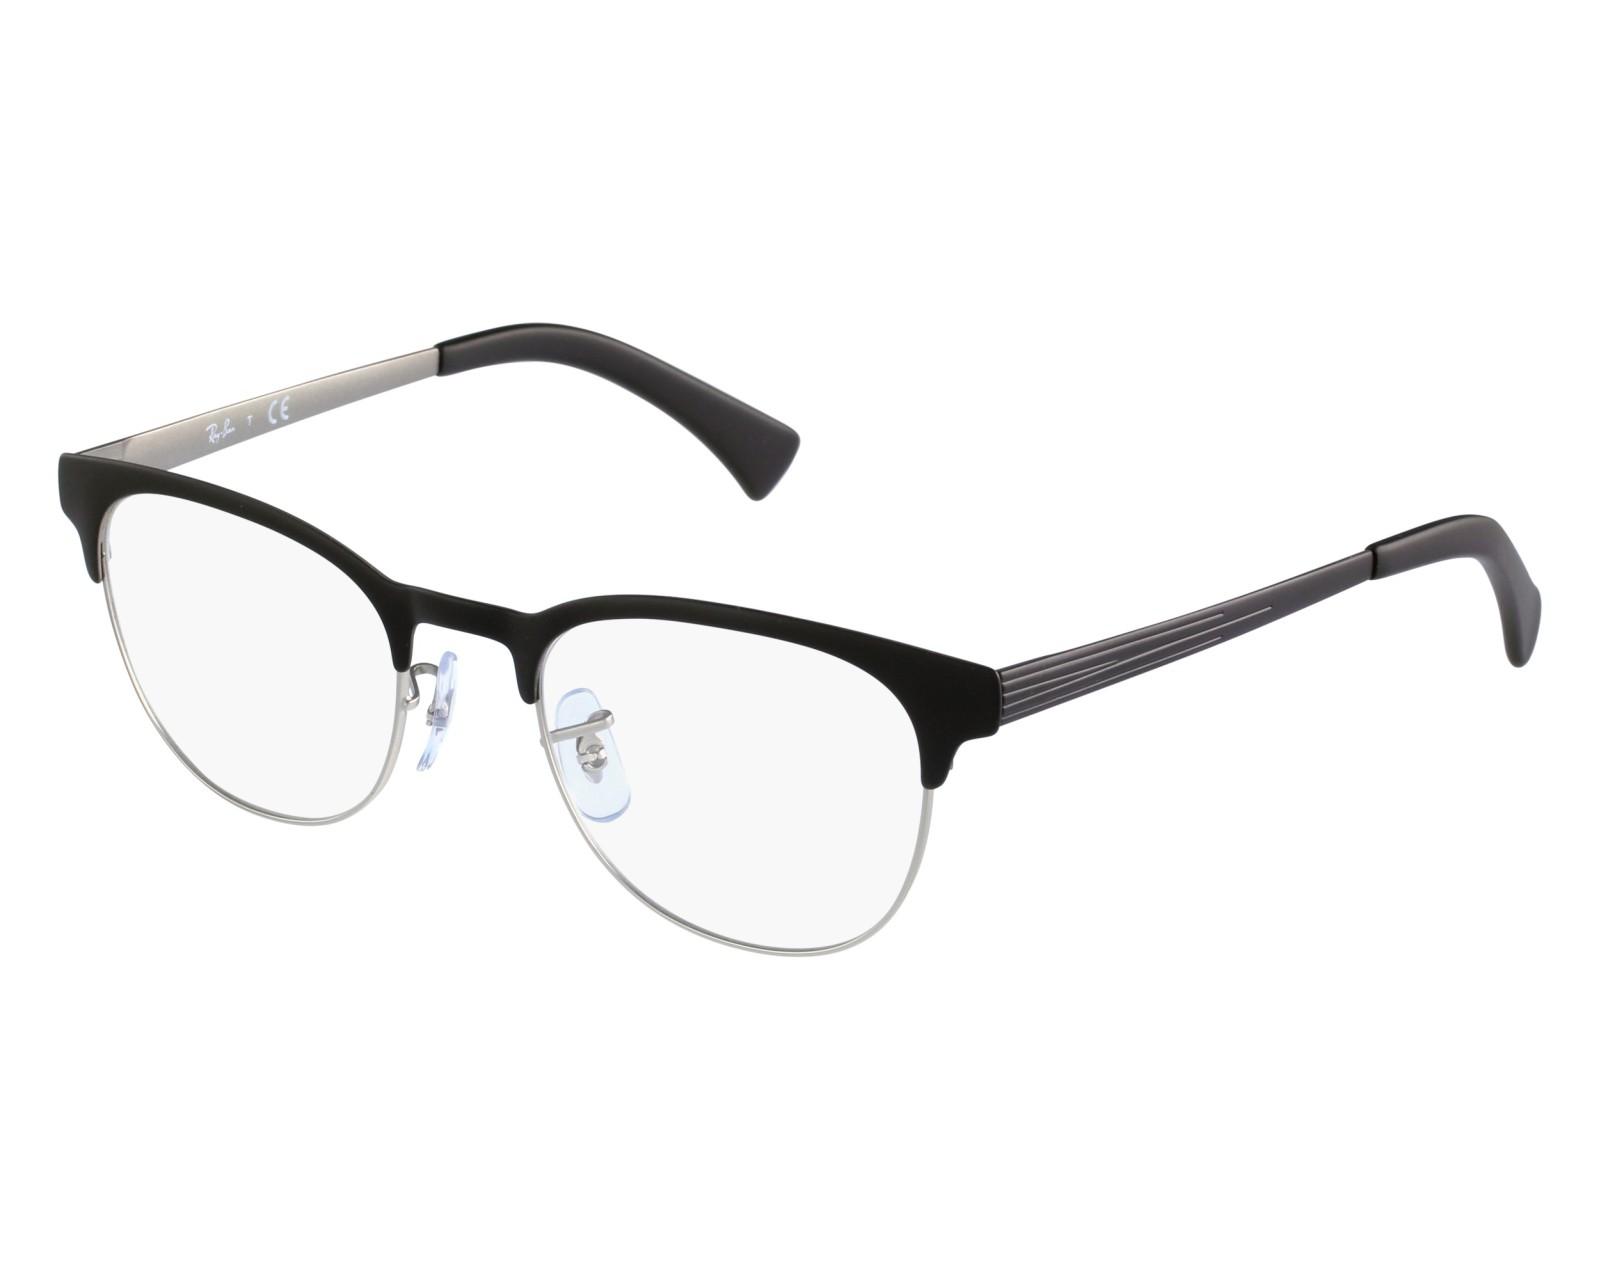 a3a6325de5 eyeglasses Ray-Ban RX-6317 2832 49-20 Black Silver front view